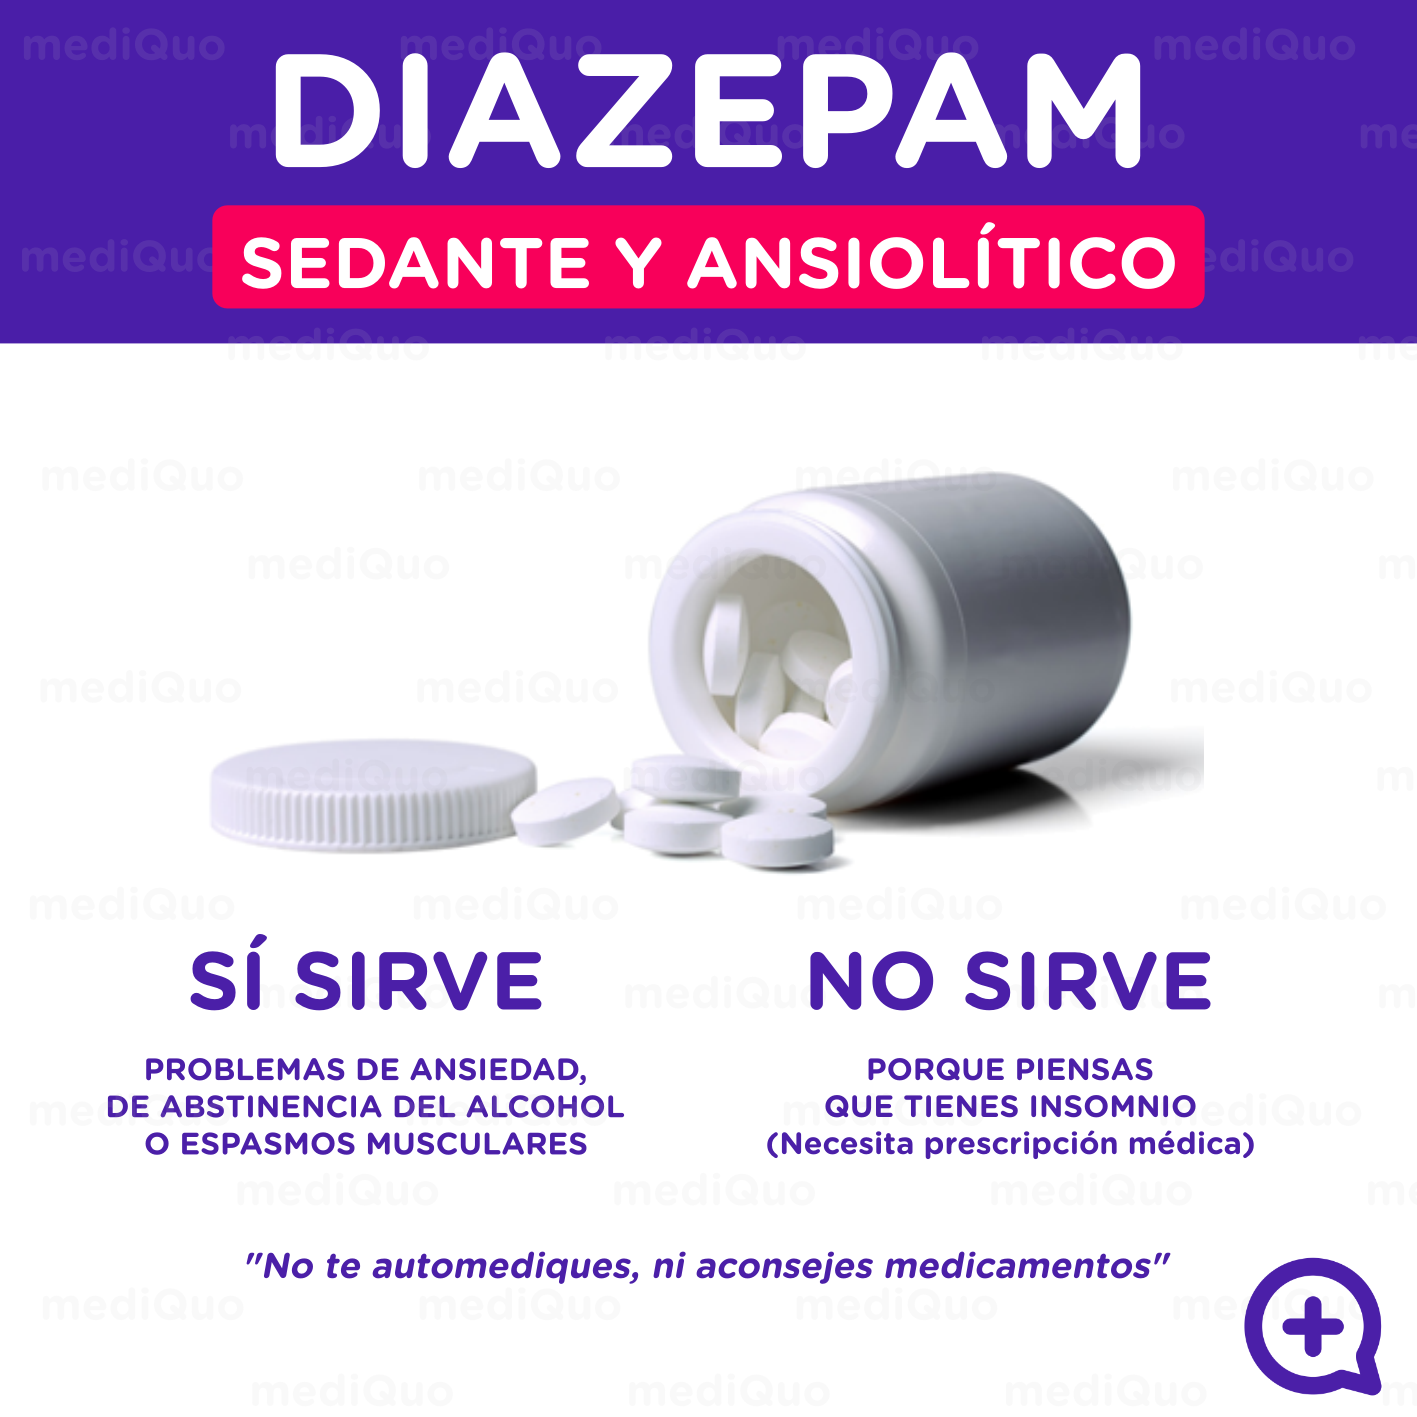 Infografías_DIAZEPAM_mediquo